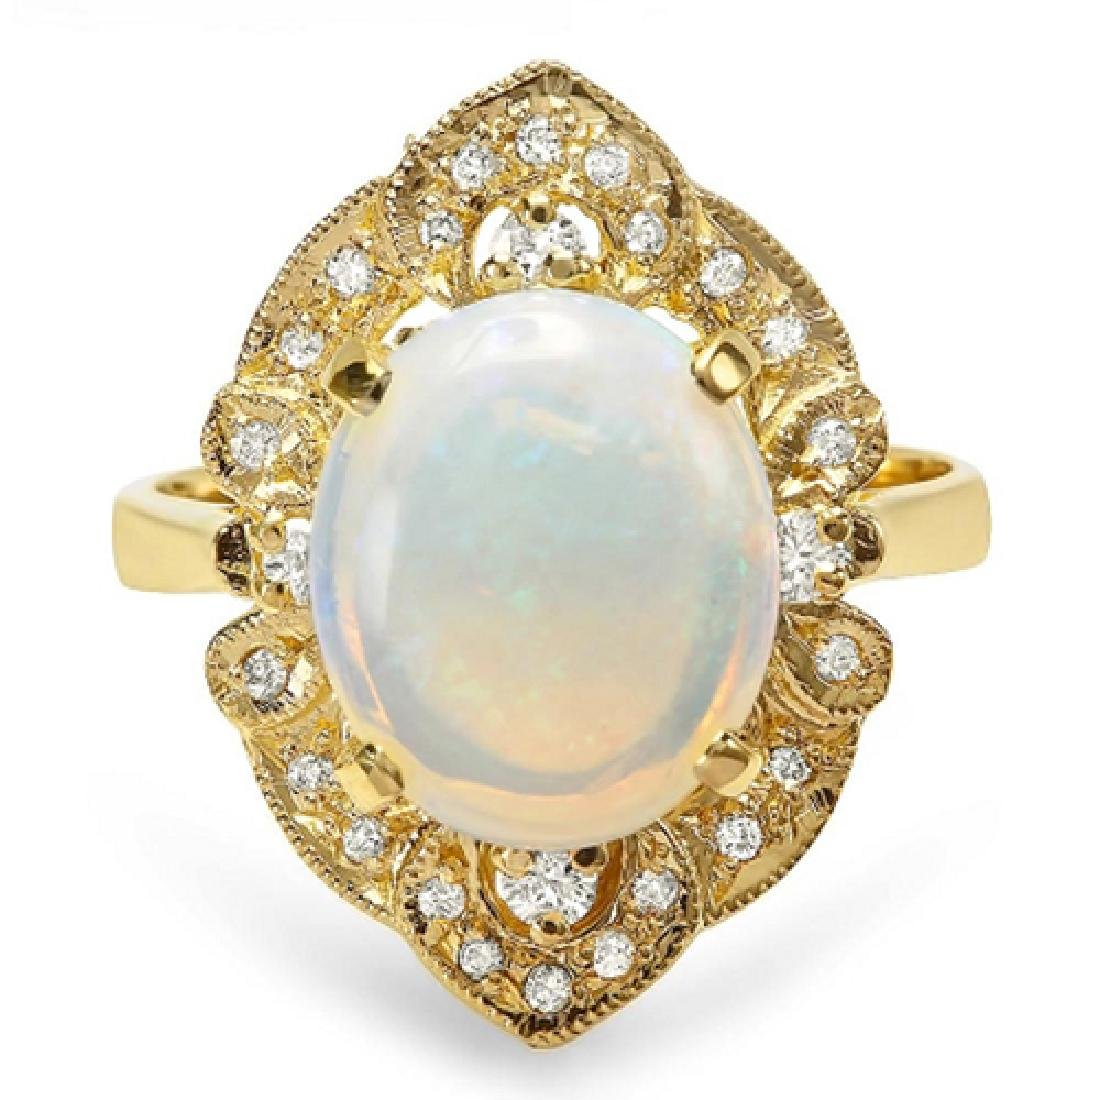 3.15 Carat Natural Opal 18K Solid Yellow Gold Diamond